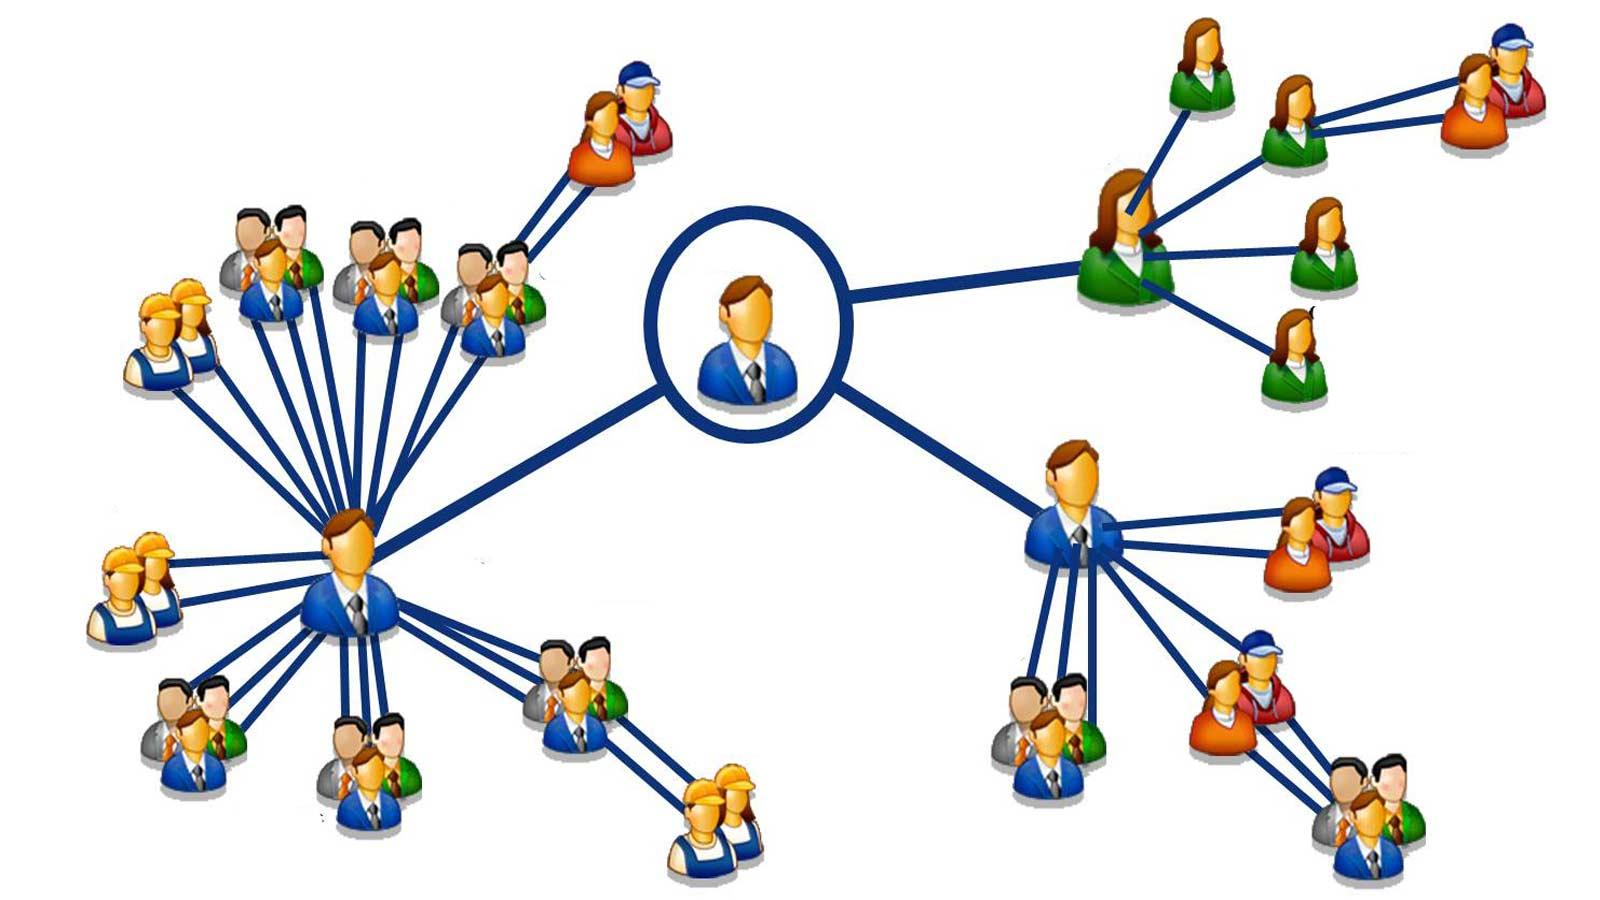 network marketing بازاریابی شبکه ای نتورک مارکتینگ بازاریابی چند سطحی Multi-level marketing